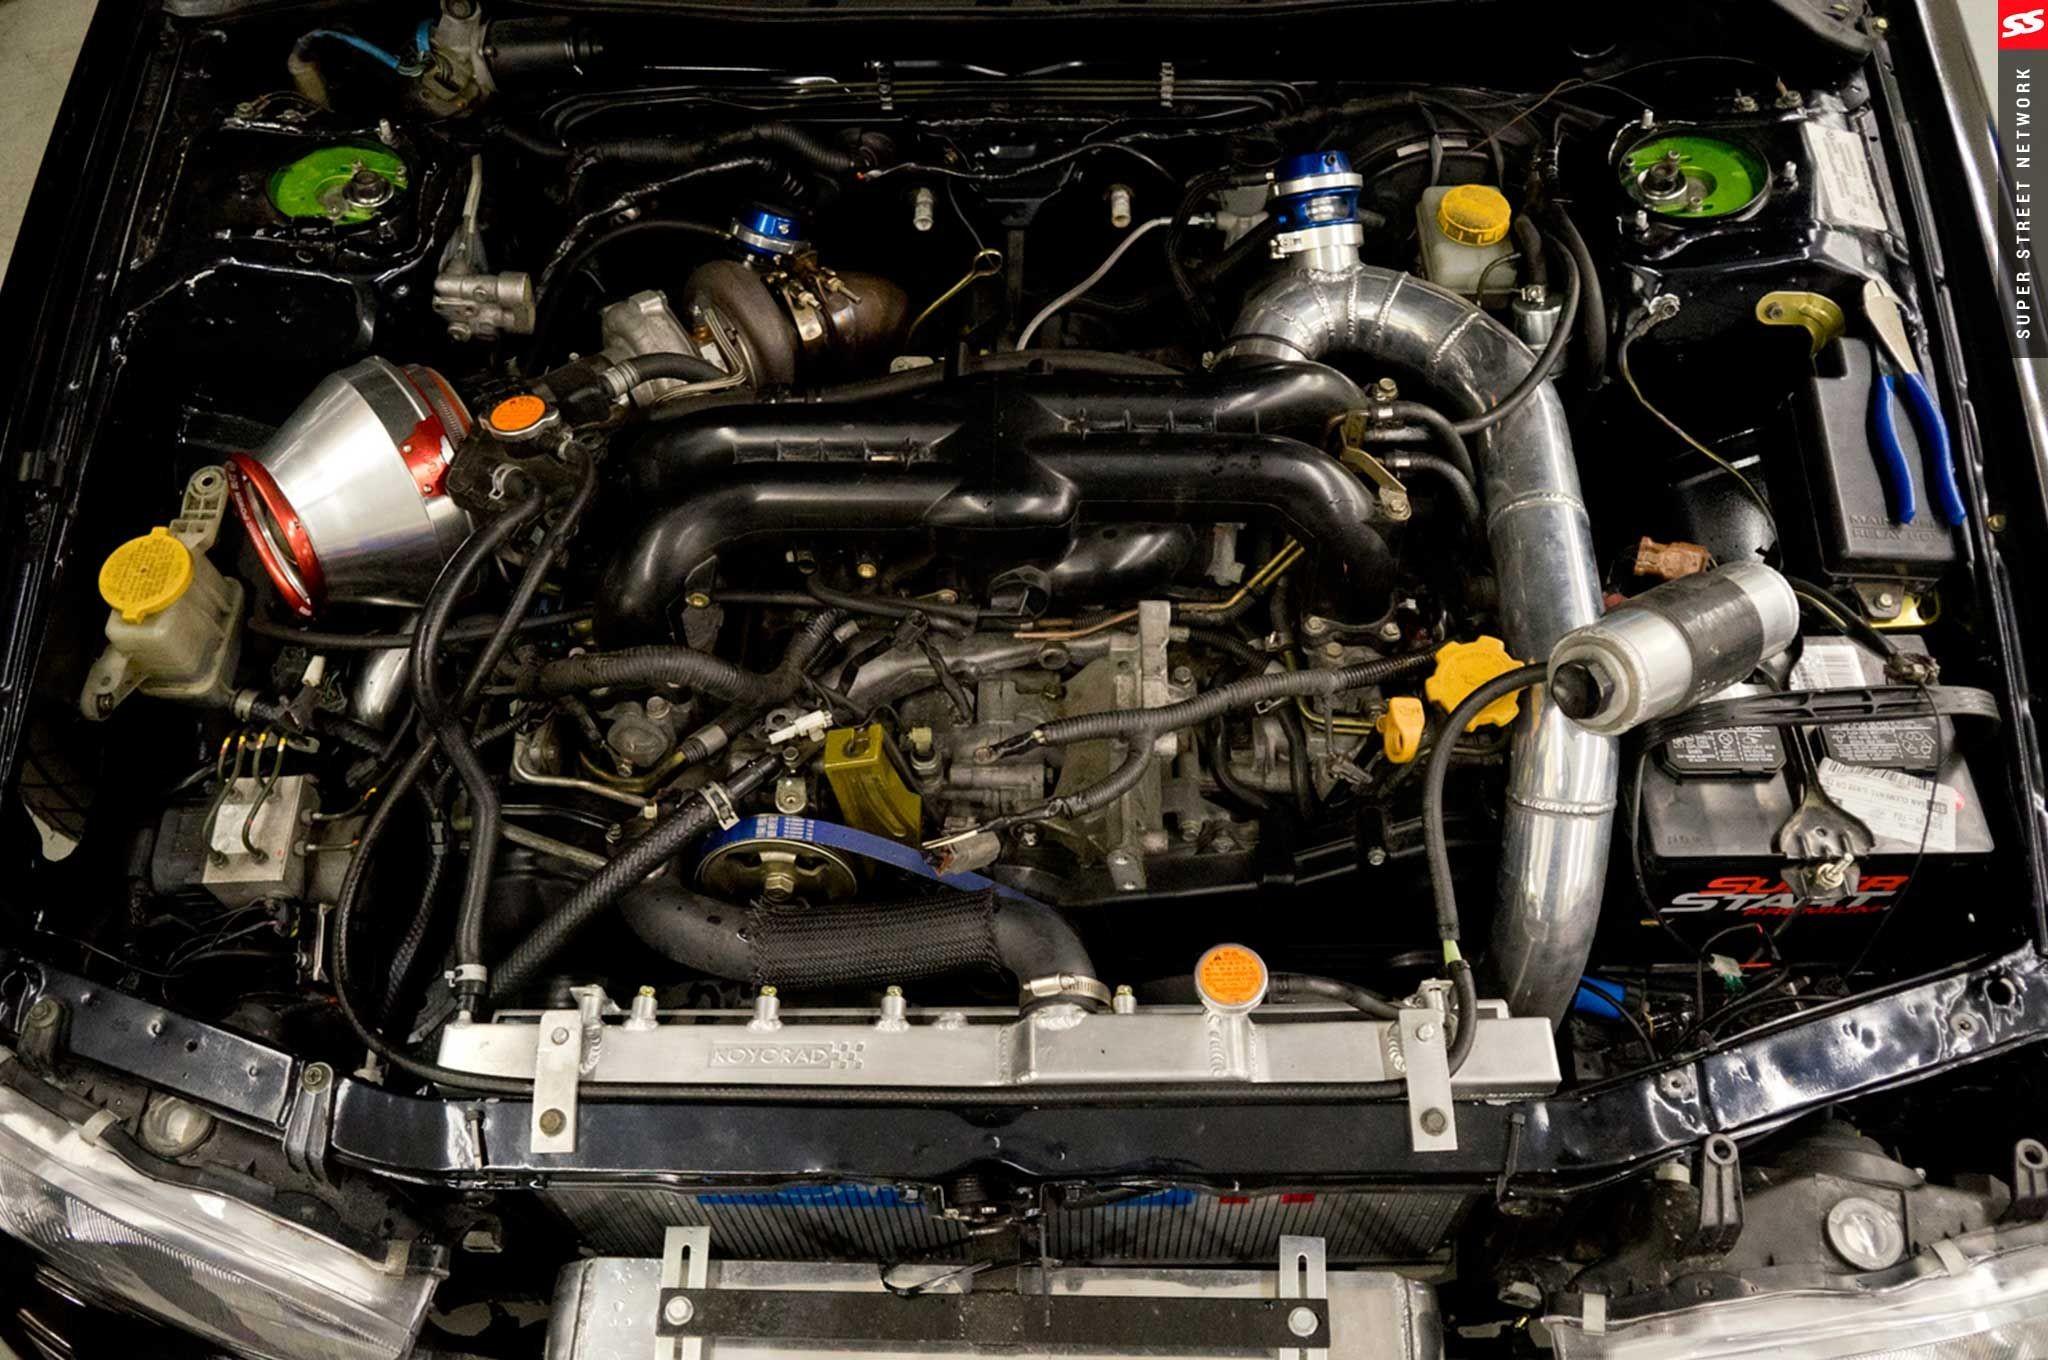 Wrx Engine Bay Diagram 98 Subaru Legacy Fuel System Upgrade Make It or Break It Of Wrx Engine Bay Diagram